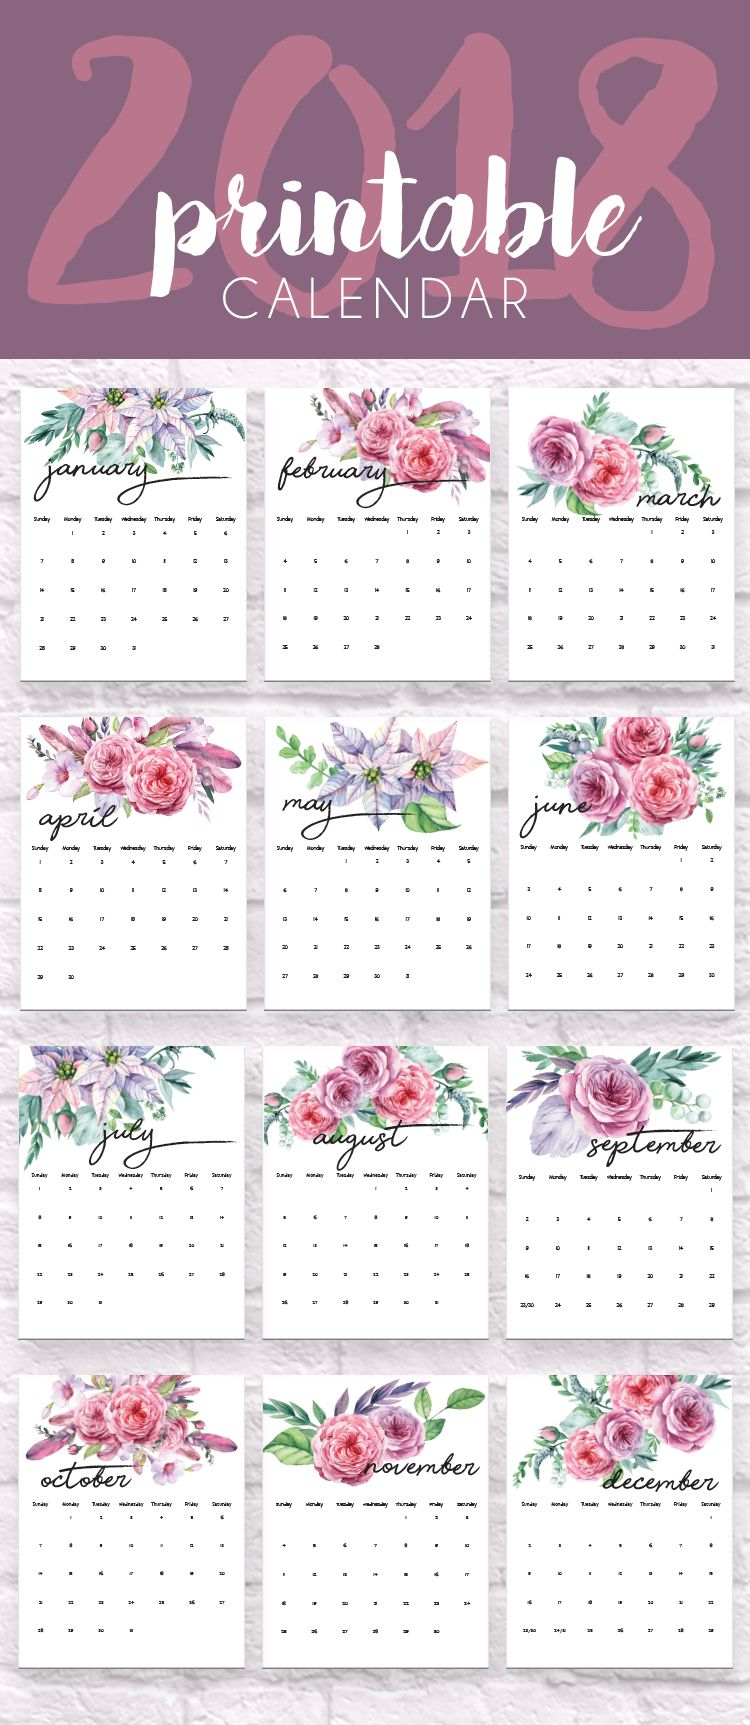 Calendrier Vista Print.2020 Printable Calendars And Planners Free Printable